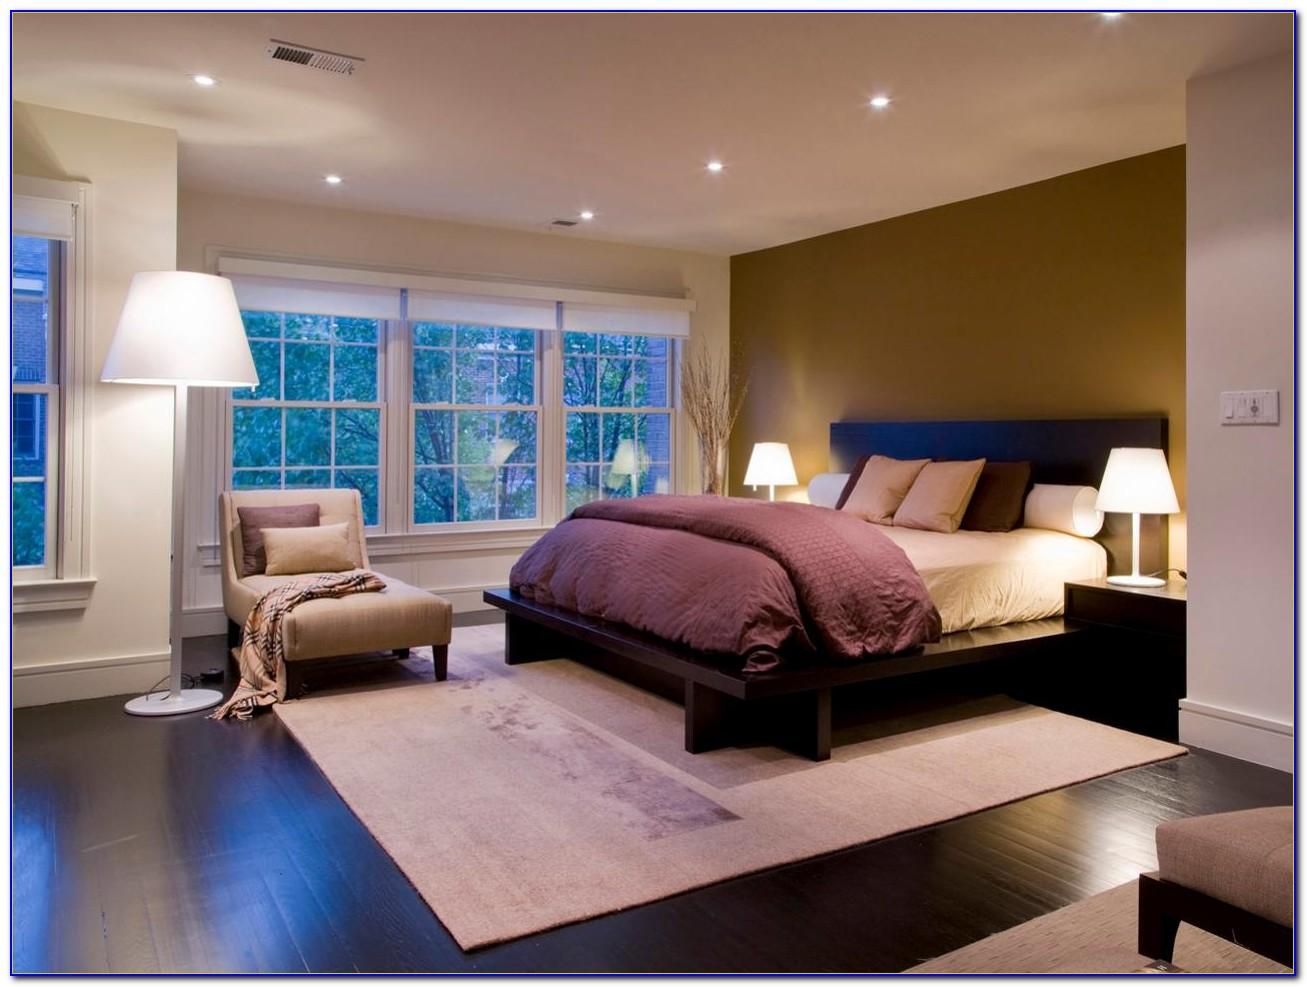 Bedroom Ceiling Light Design